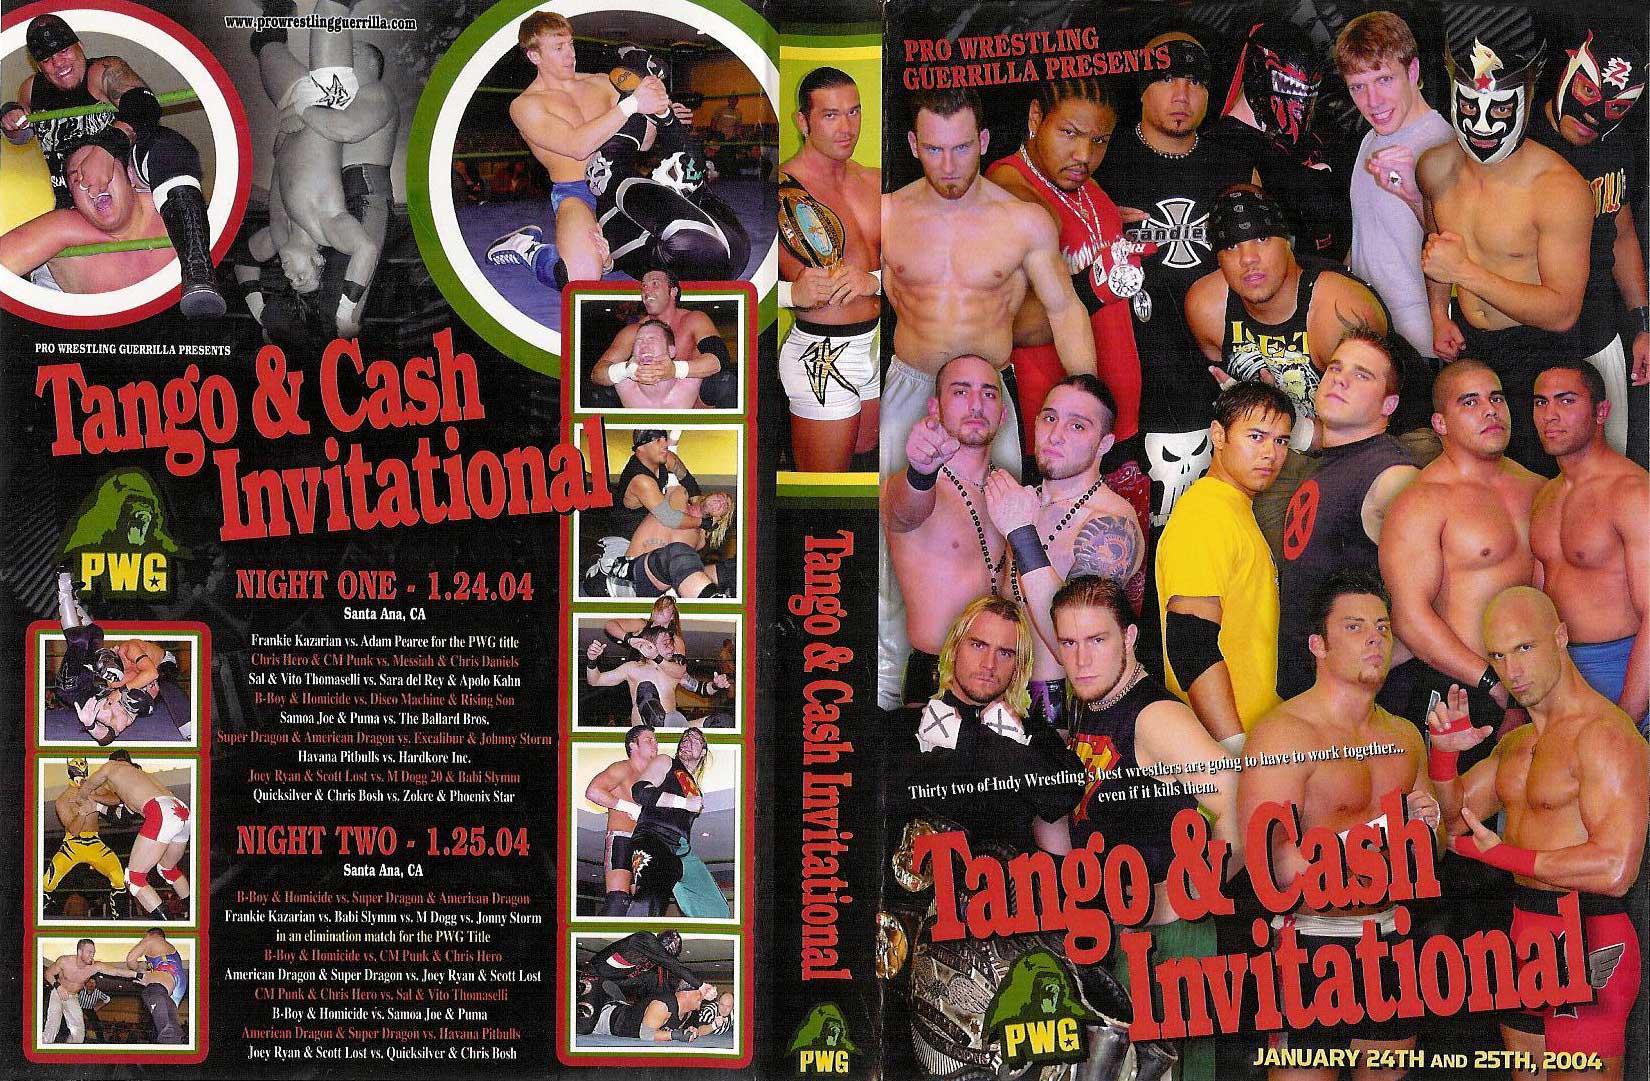 PWG-Tango-&-Cash-Invitation